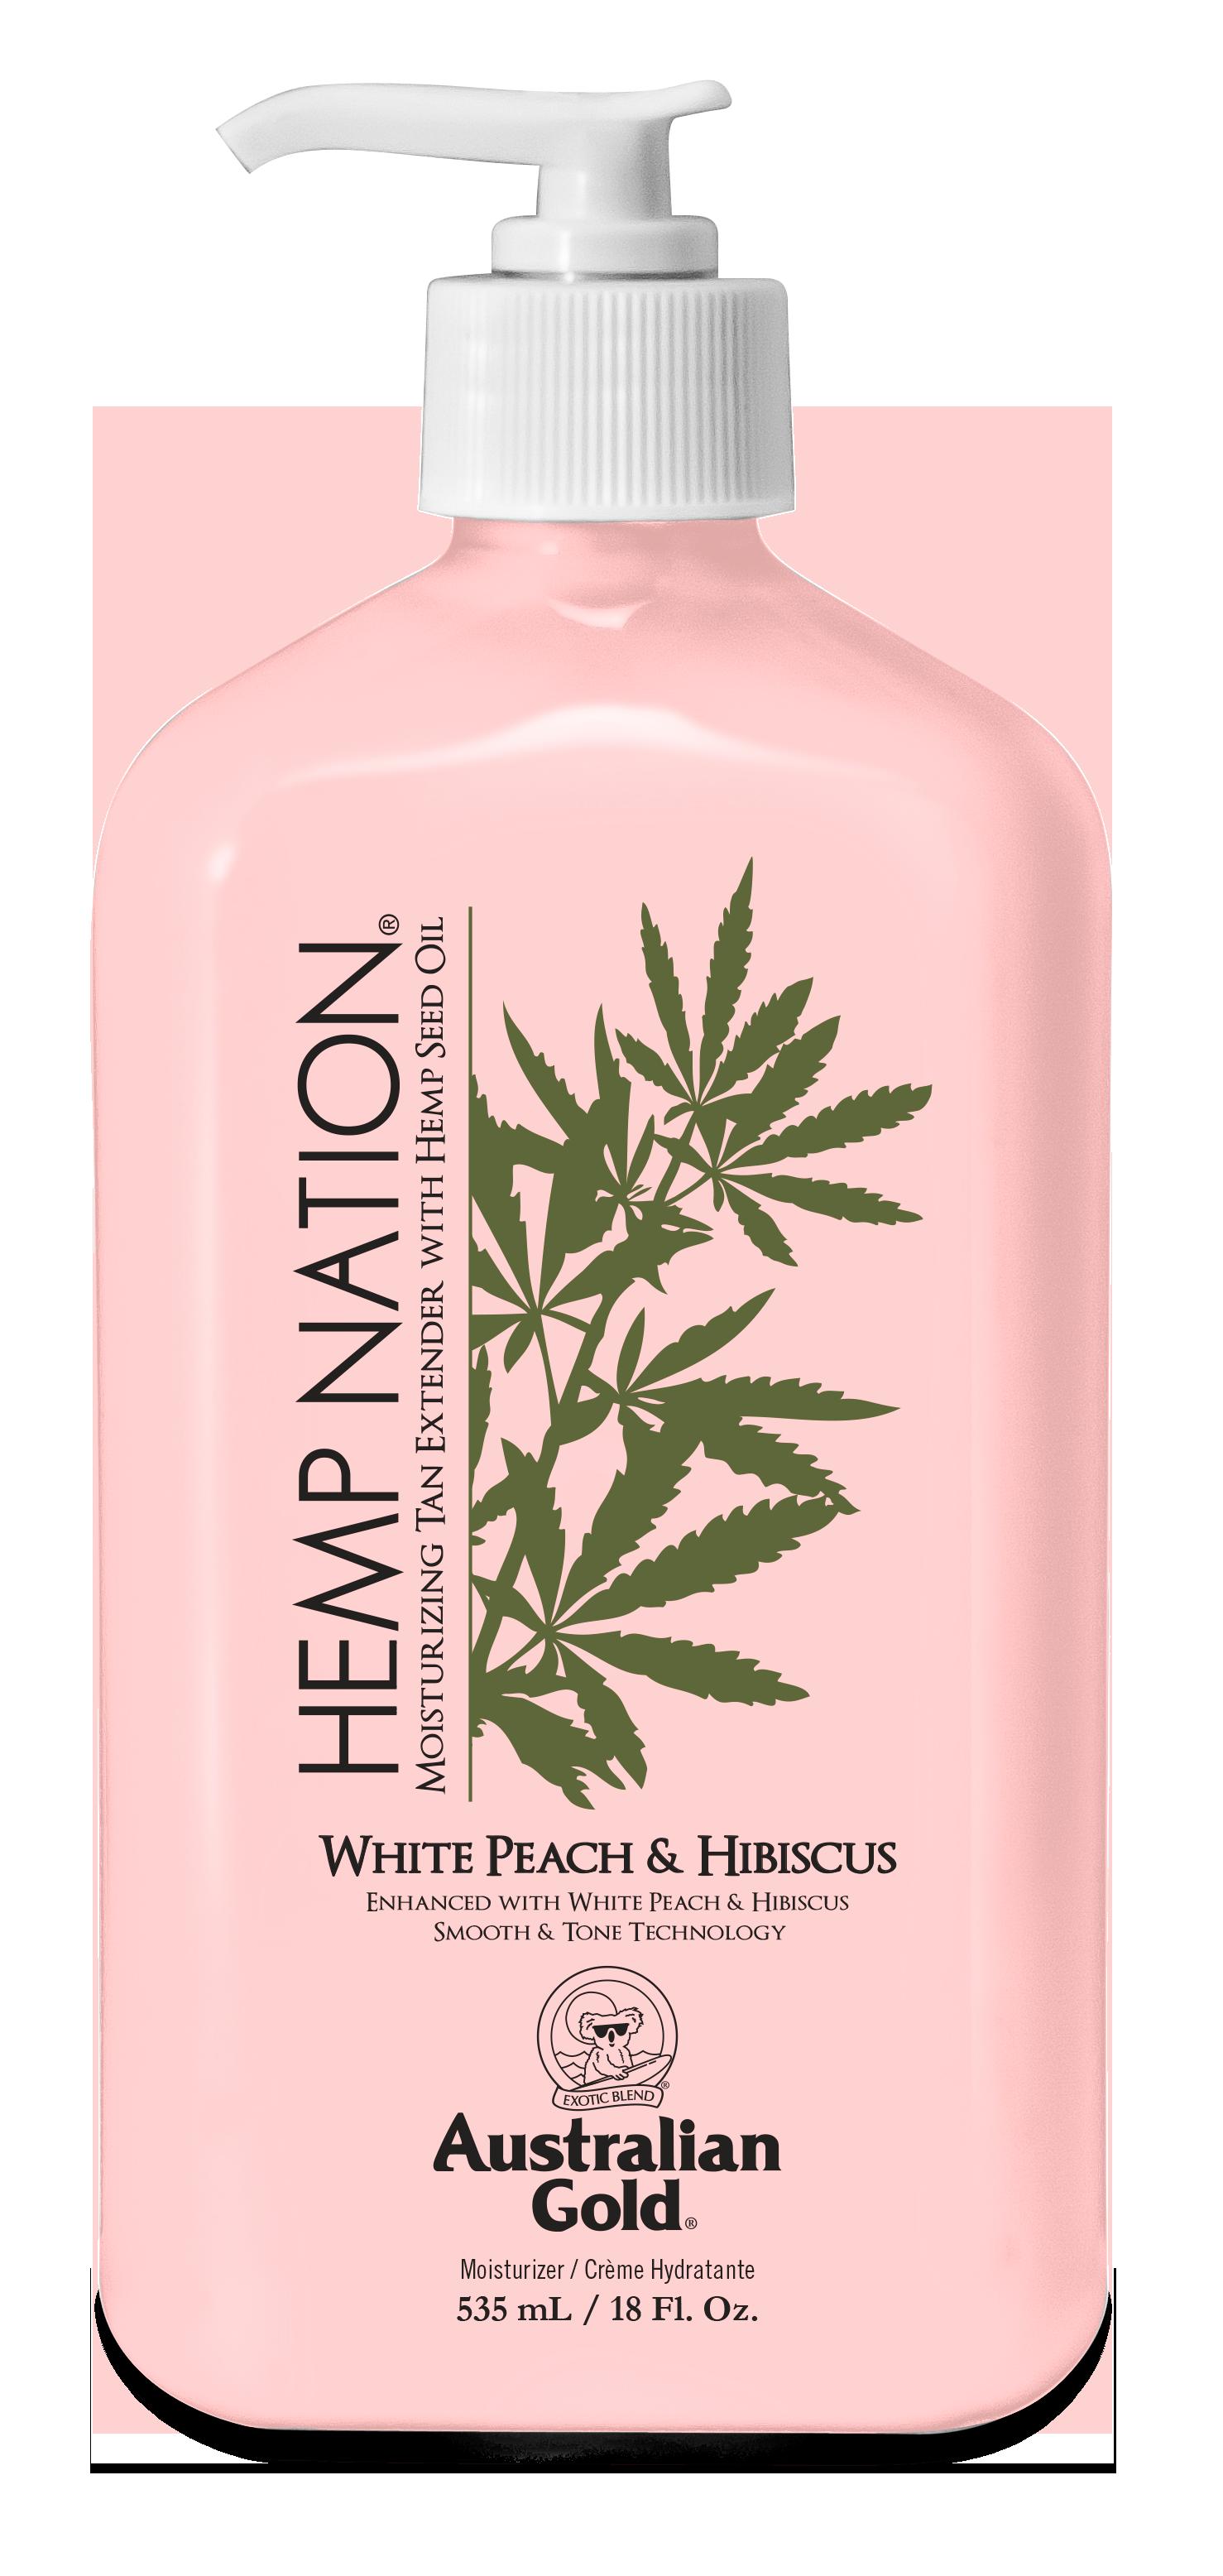 Australian Gold - Hemp Nation White Peach & Hibiscus Tan Extender Body Lotion 535 ml